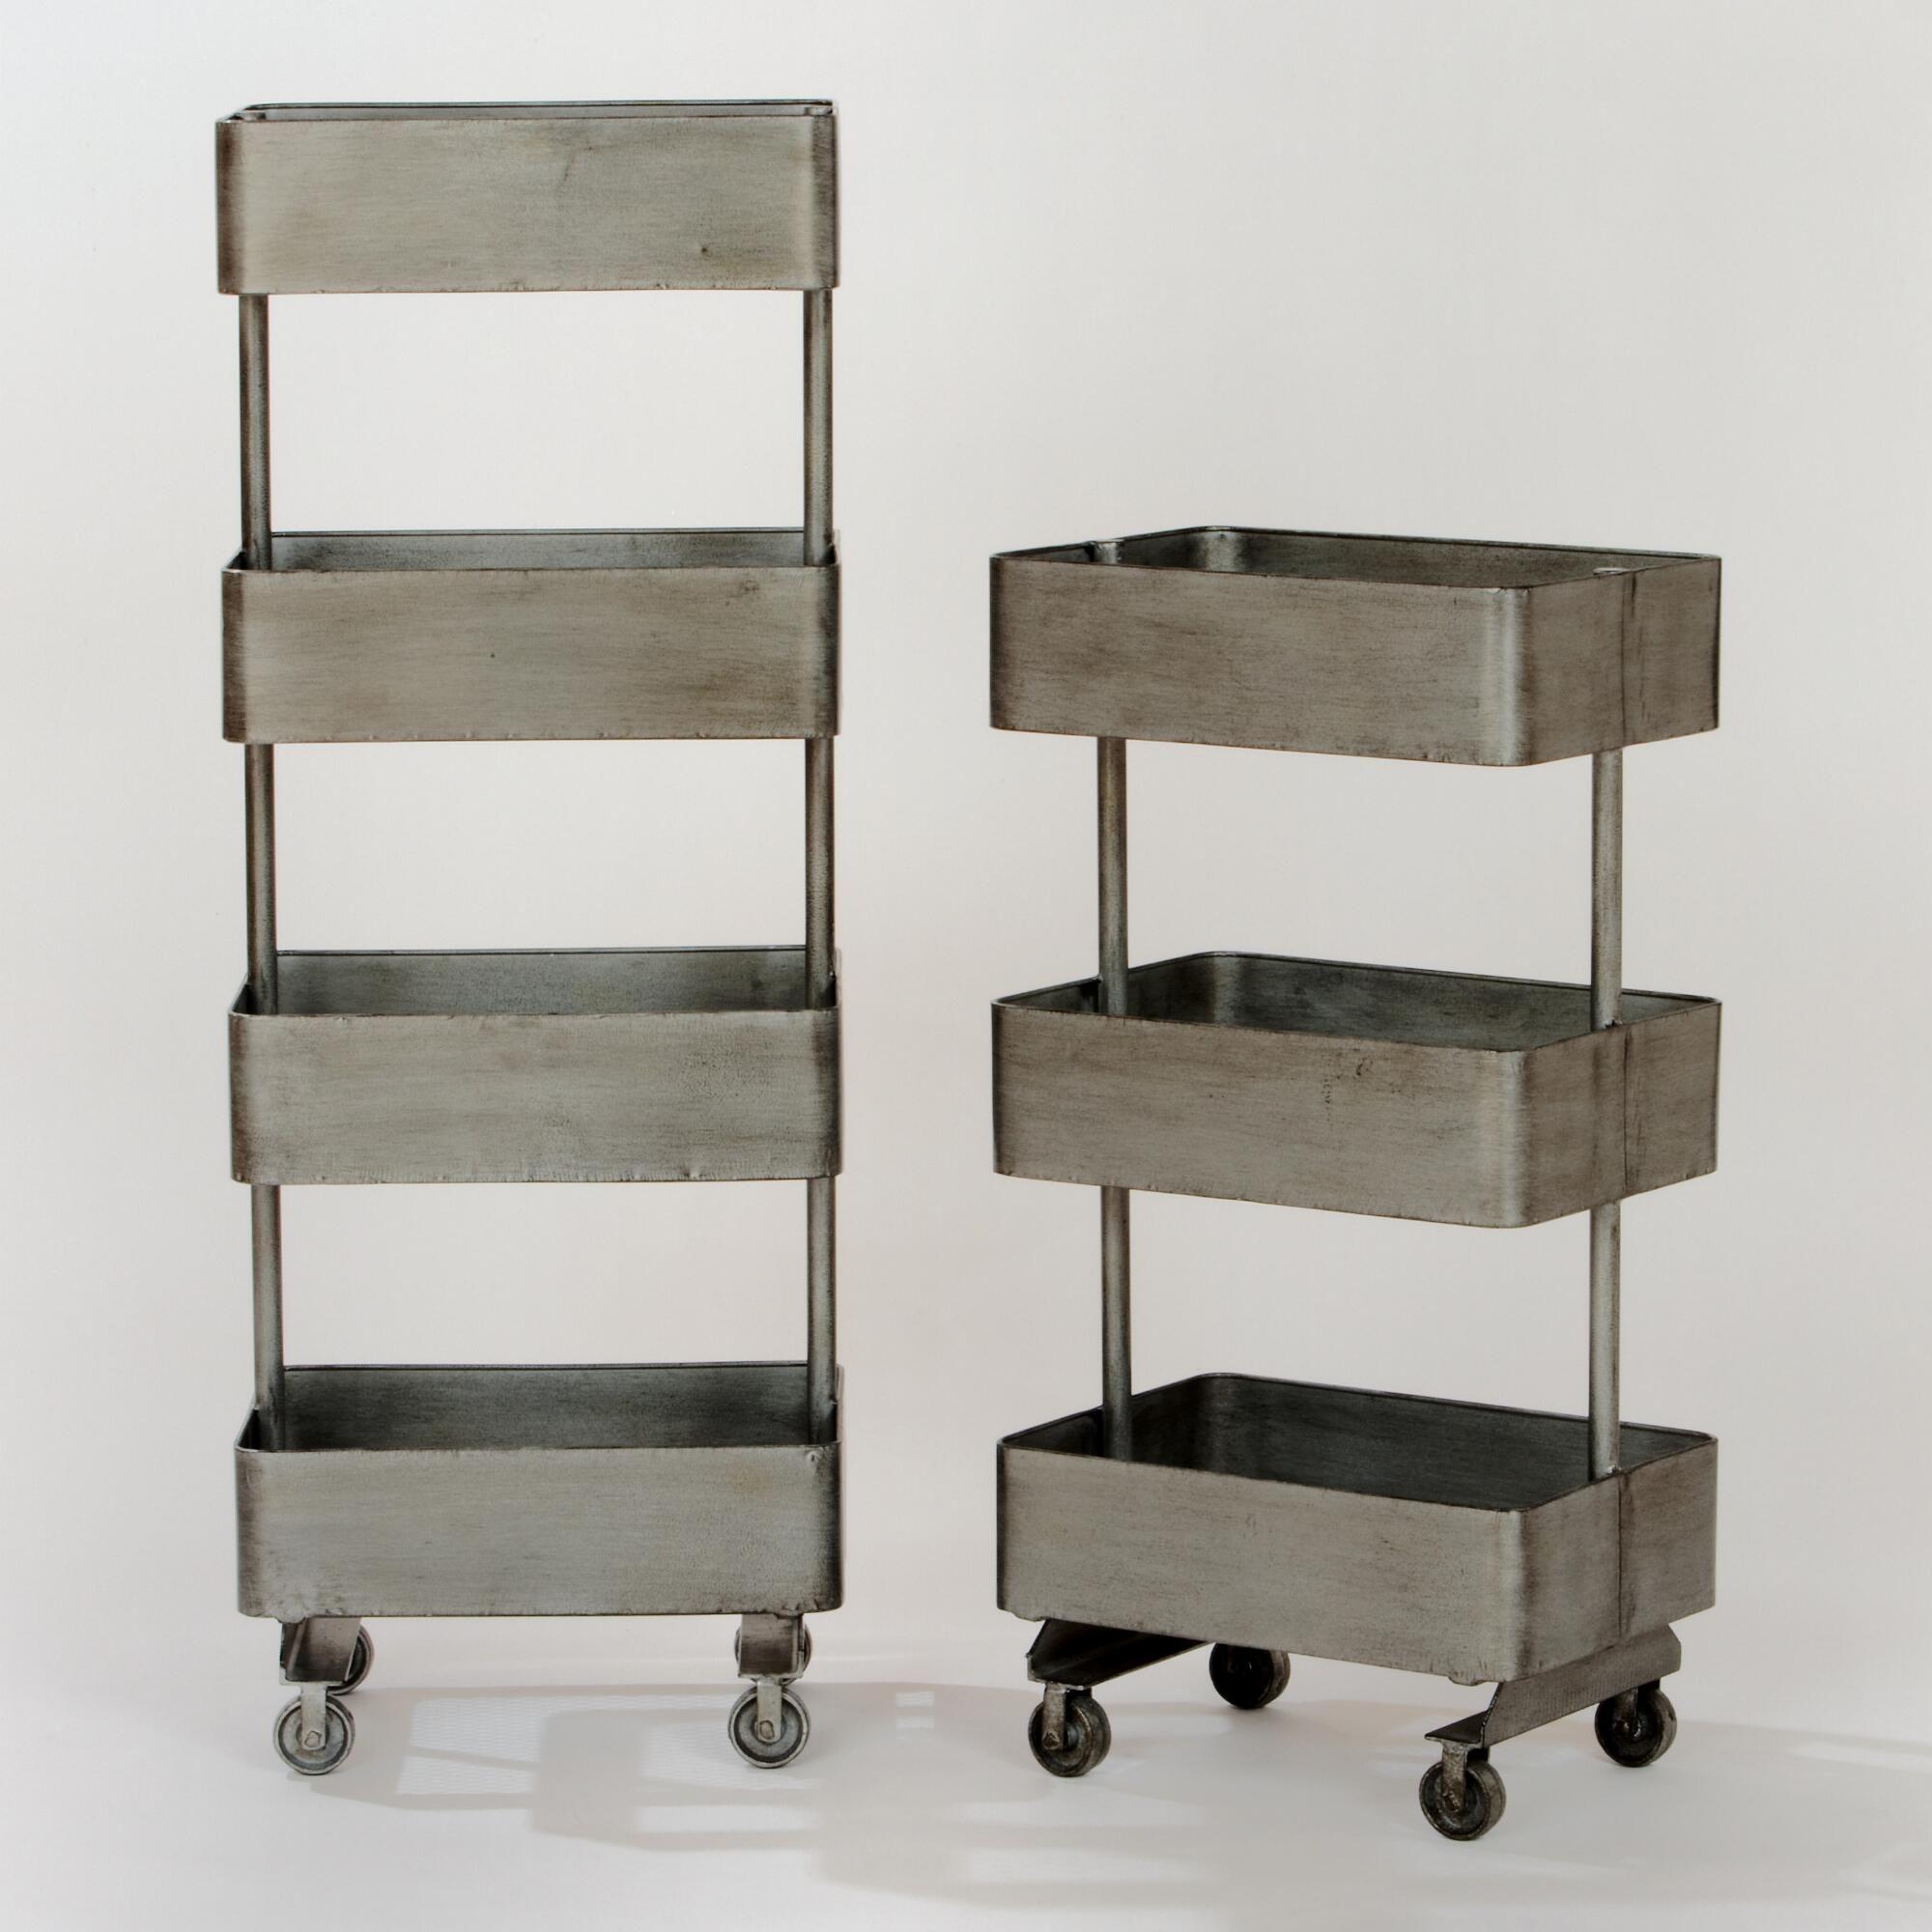 Badezimmer Regale Ikea Raskog Badezimmer Regal Regal Metall